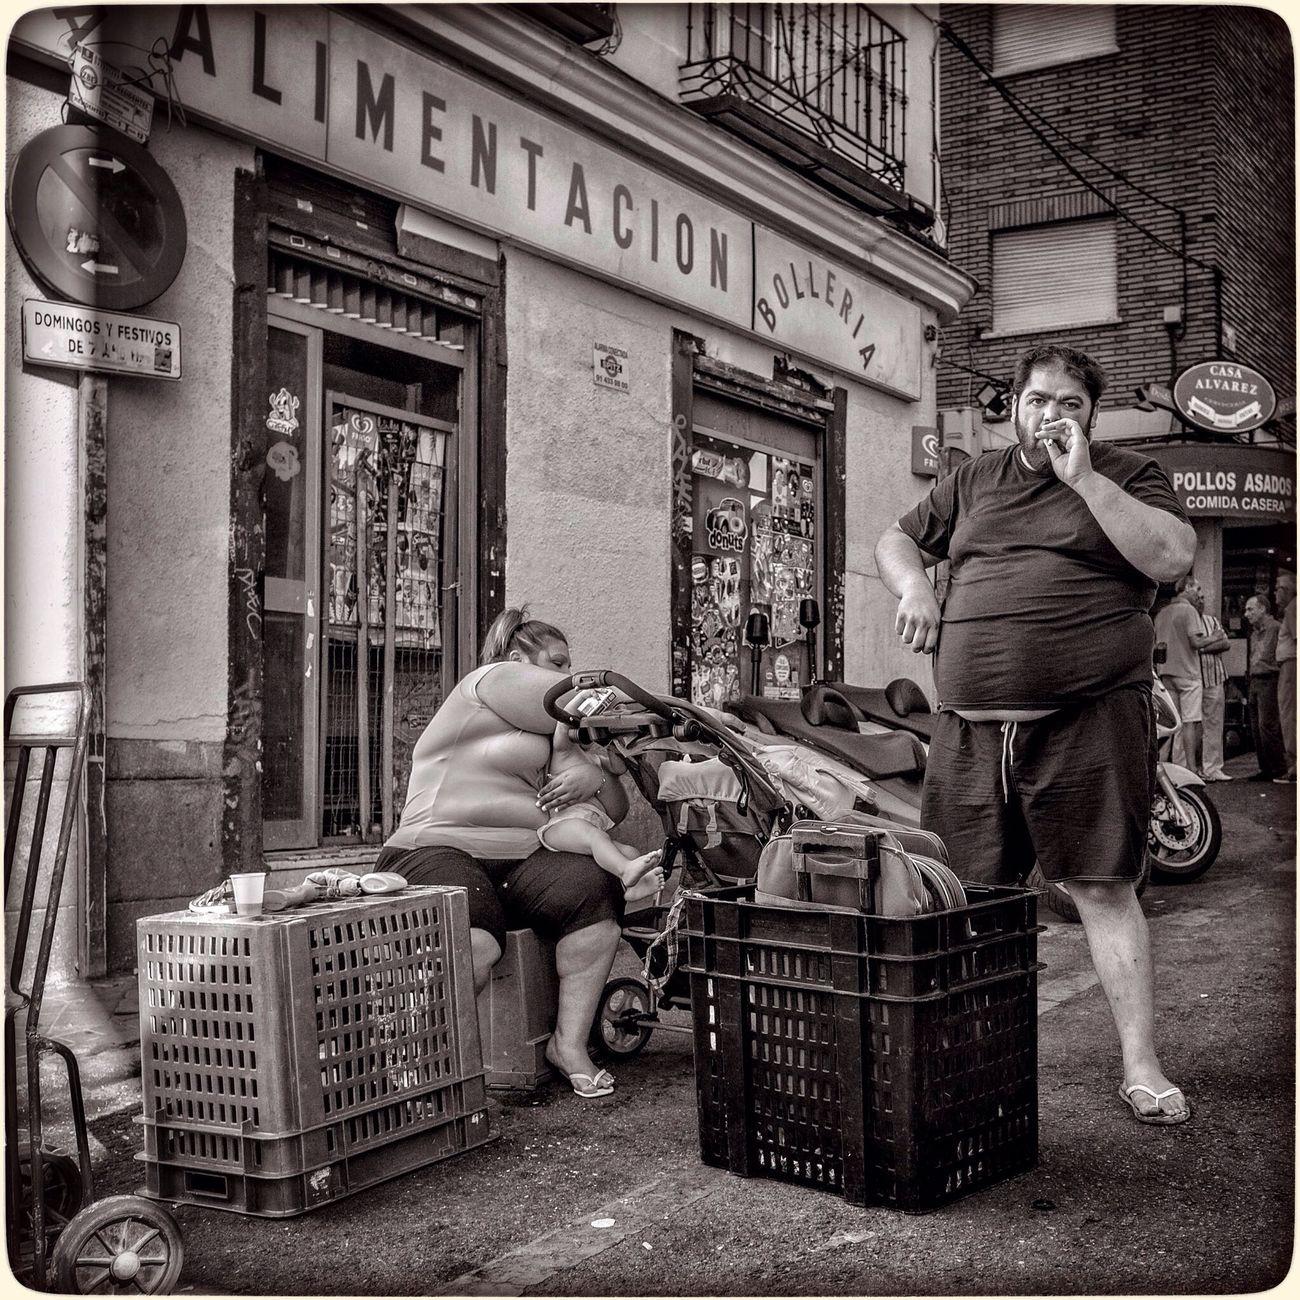 Black & White Street Photography from El Rastro market The Street Photographer - 2014 EyeEm Awards